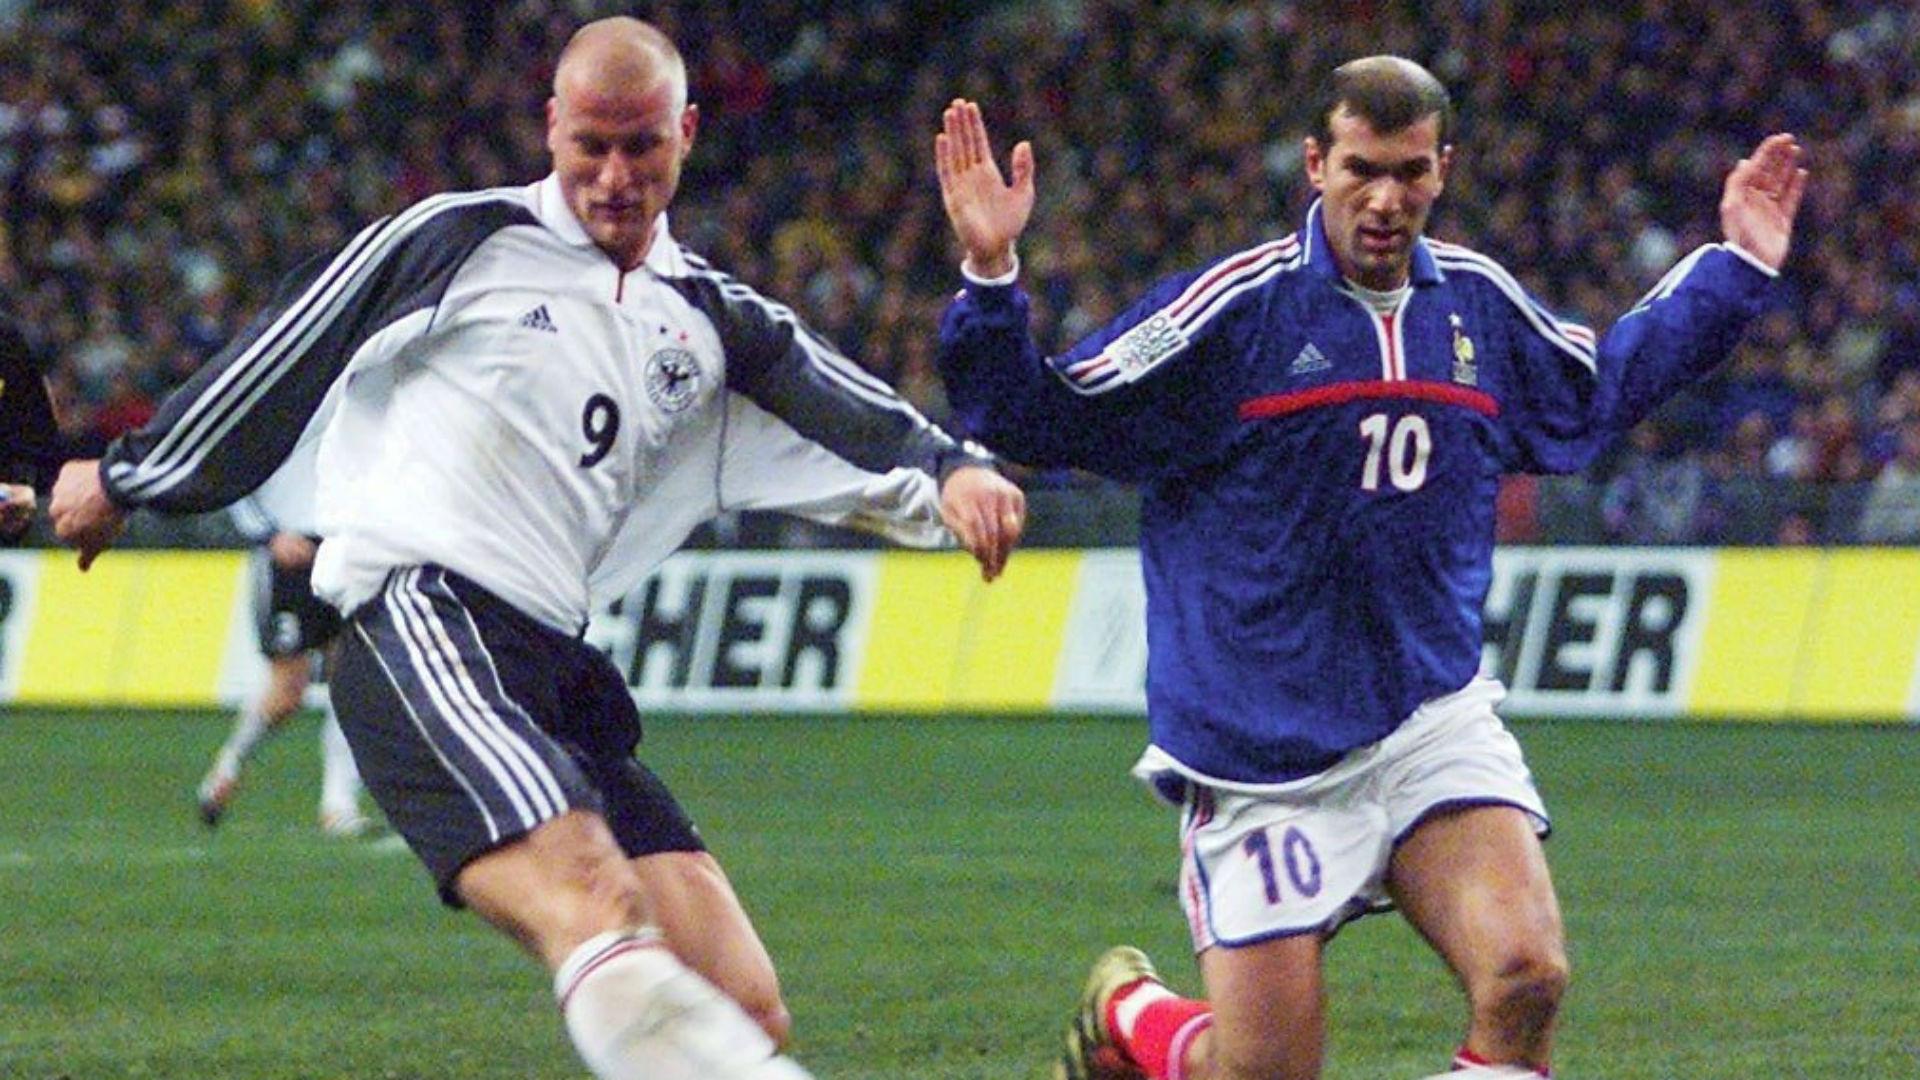 Top 5 des rencontres France - Allemagne